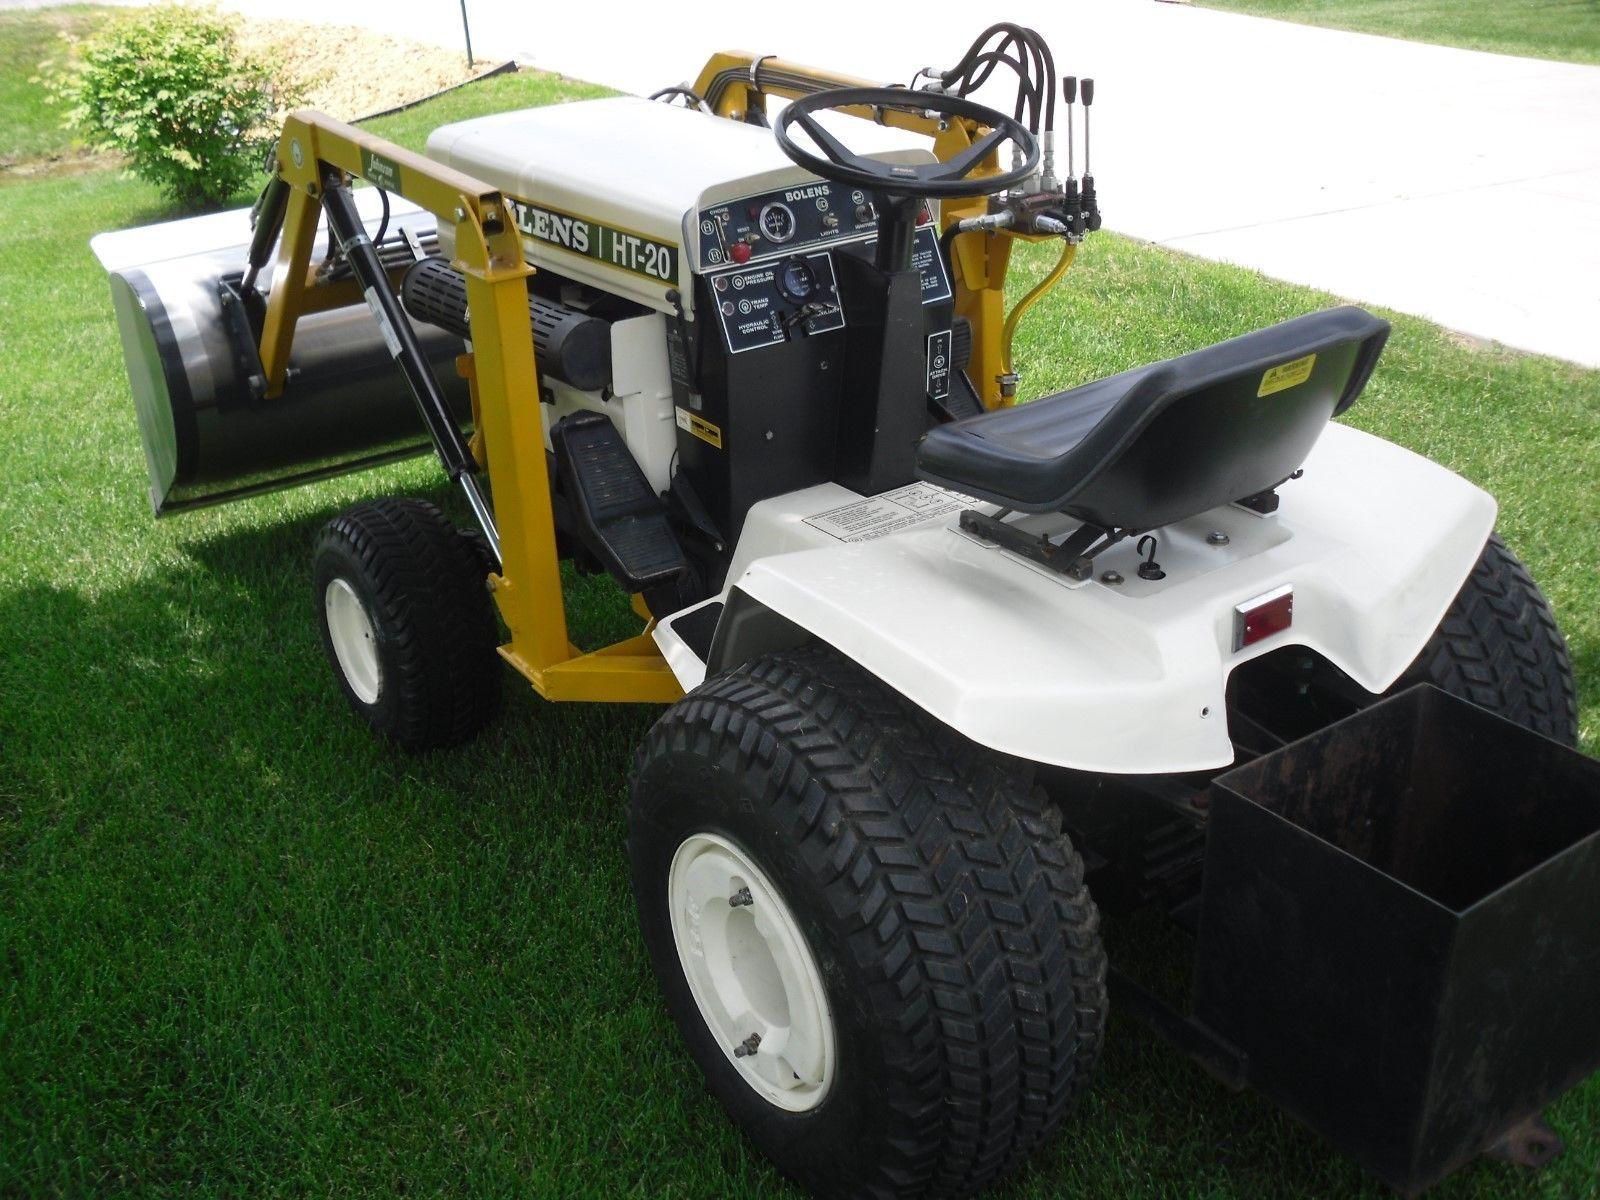 BOLENS HT-20 GARDEN TRACTOR WITH LOADER | eBay | Lawn Mowers